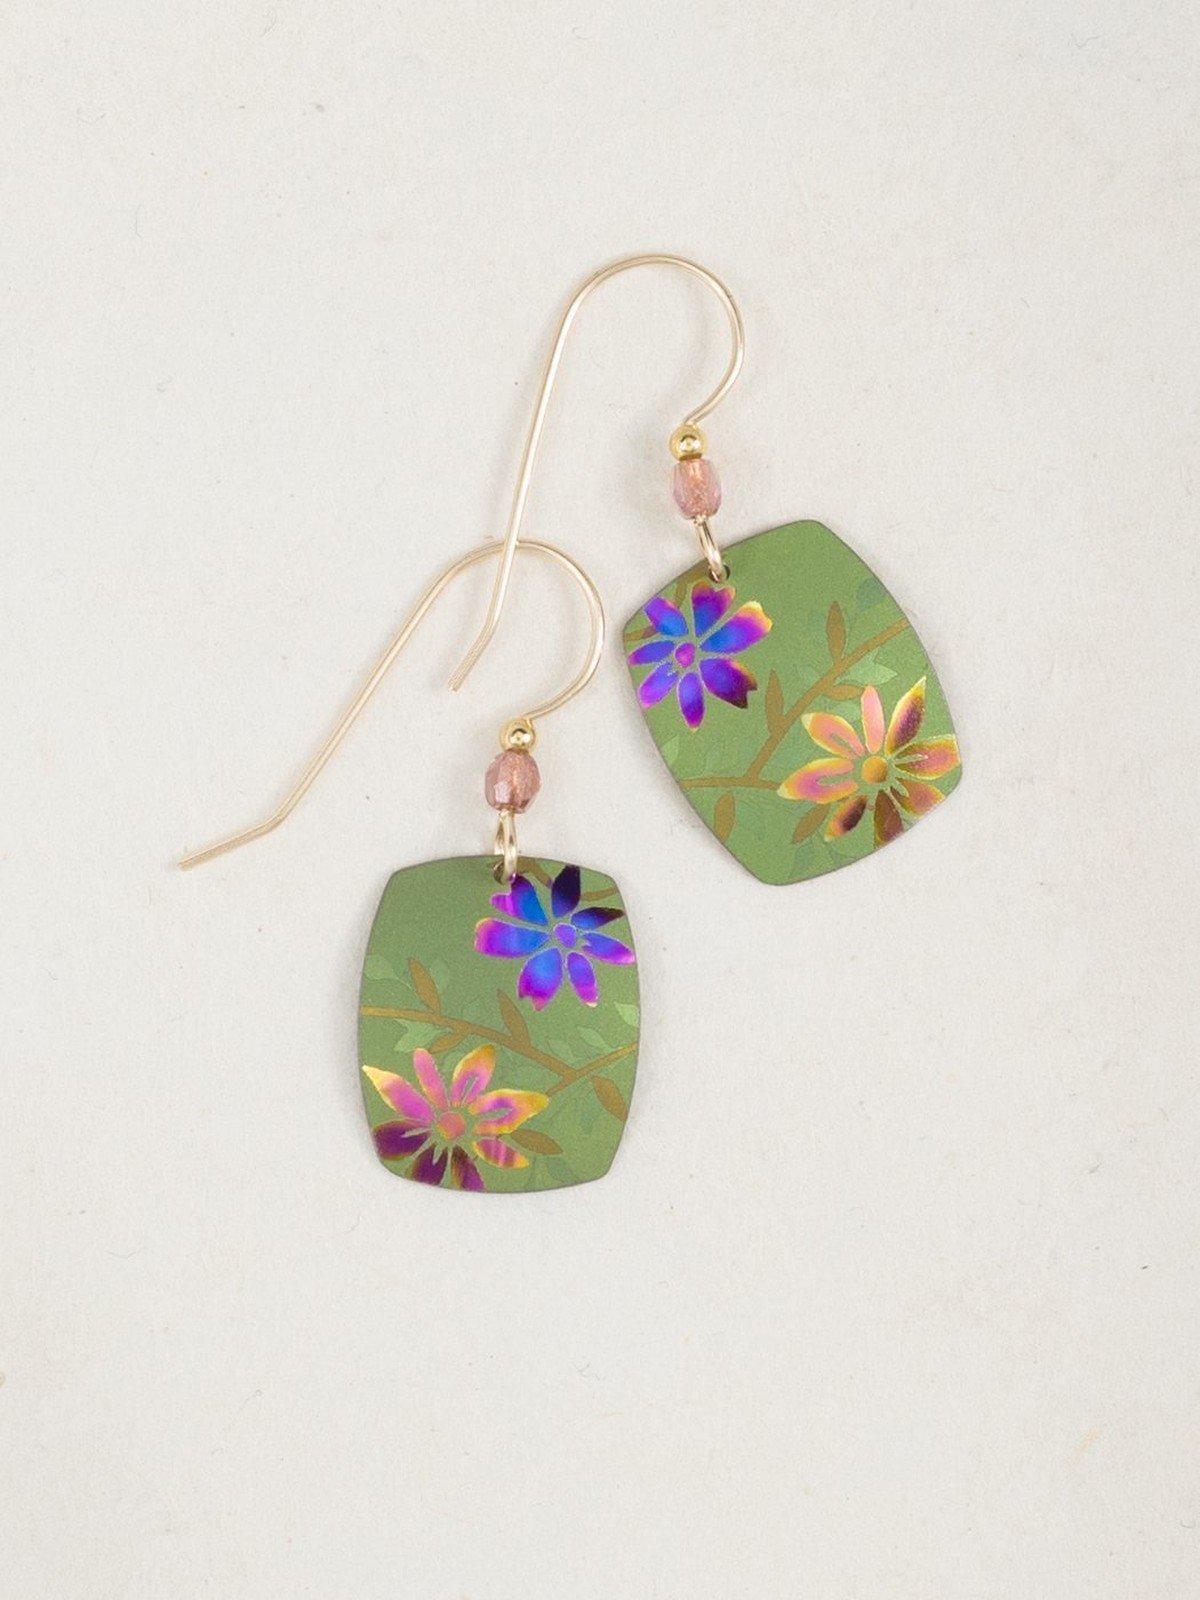 Bright Green Flower Meadow Earrings by Holly Yashi Jewelry